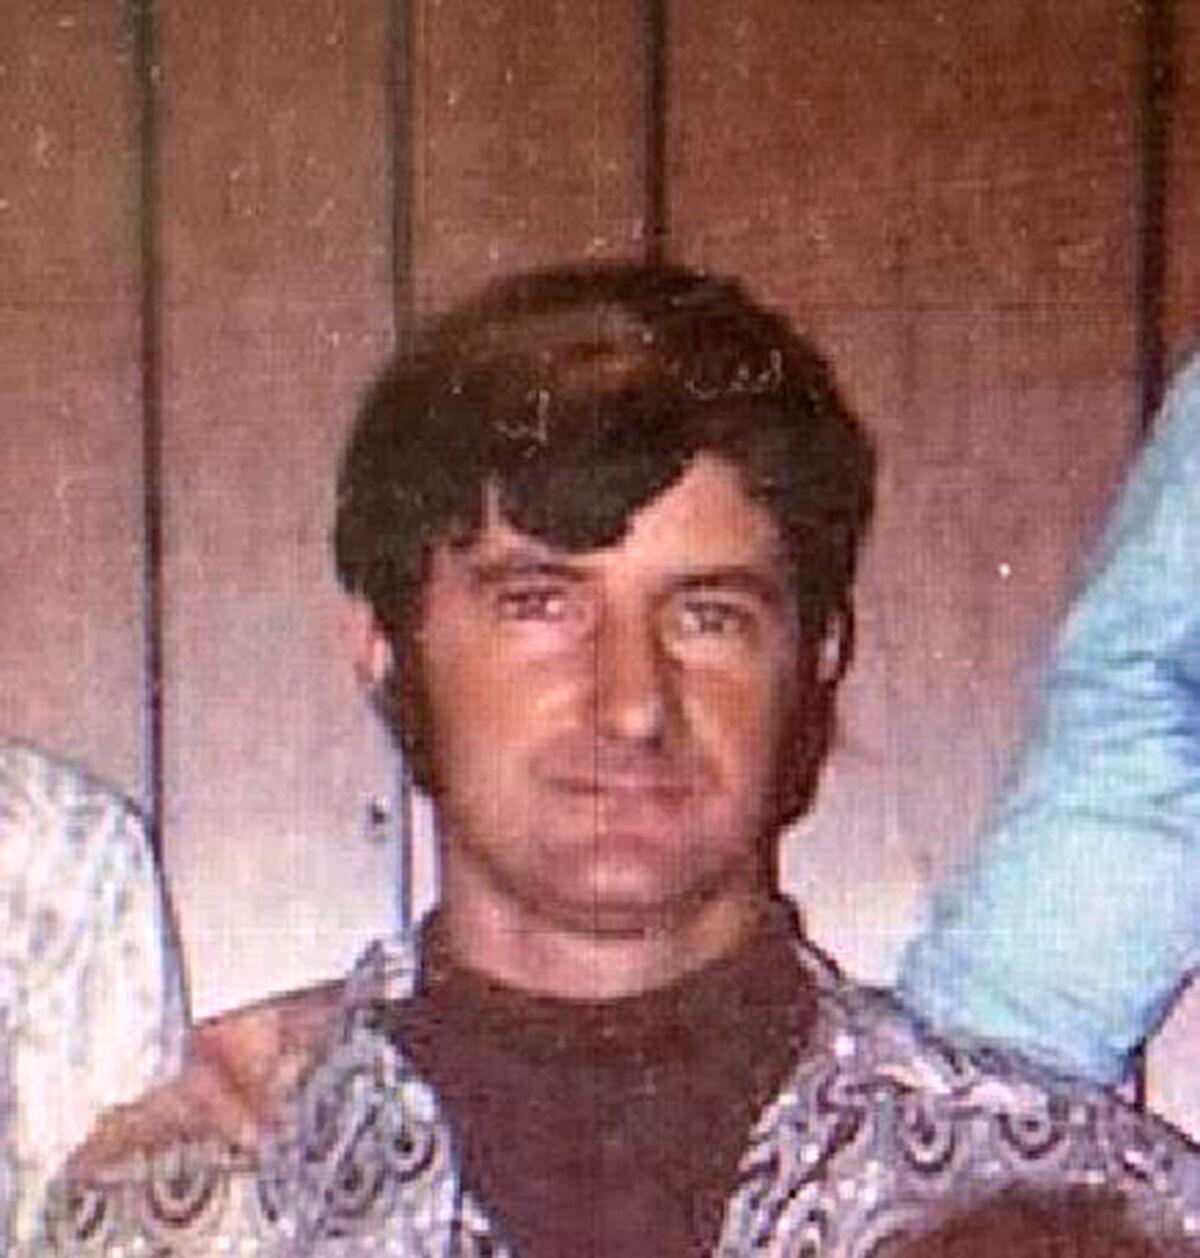 Richard Davis in 1973